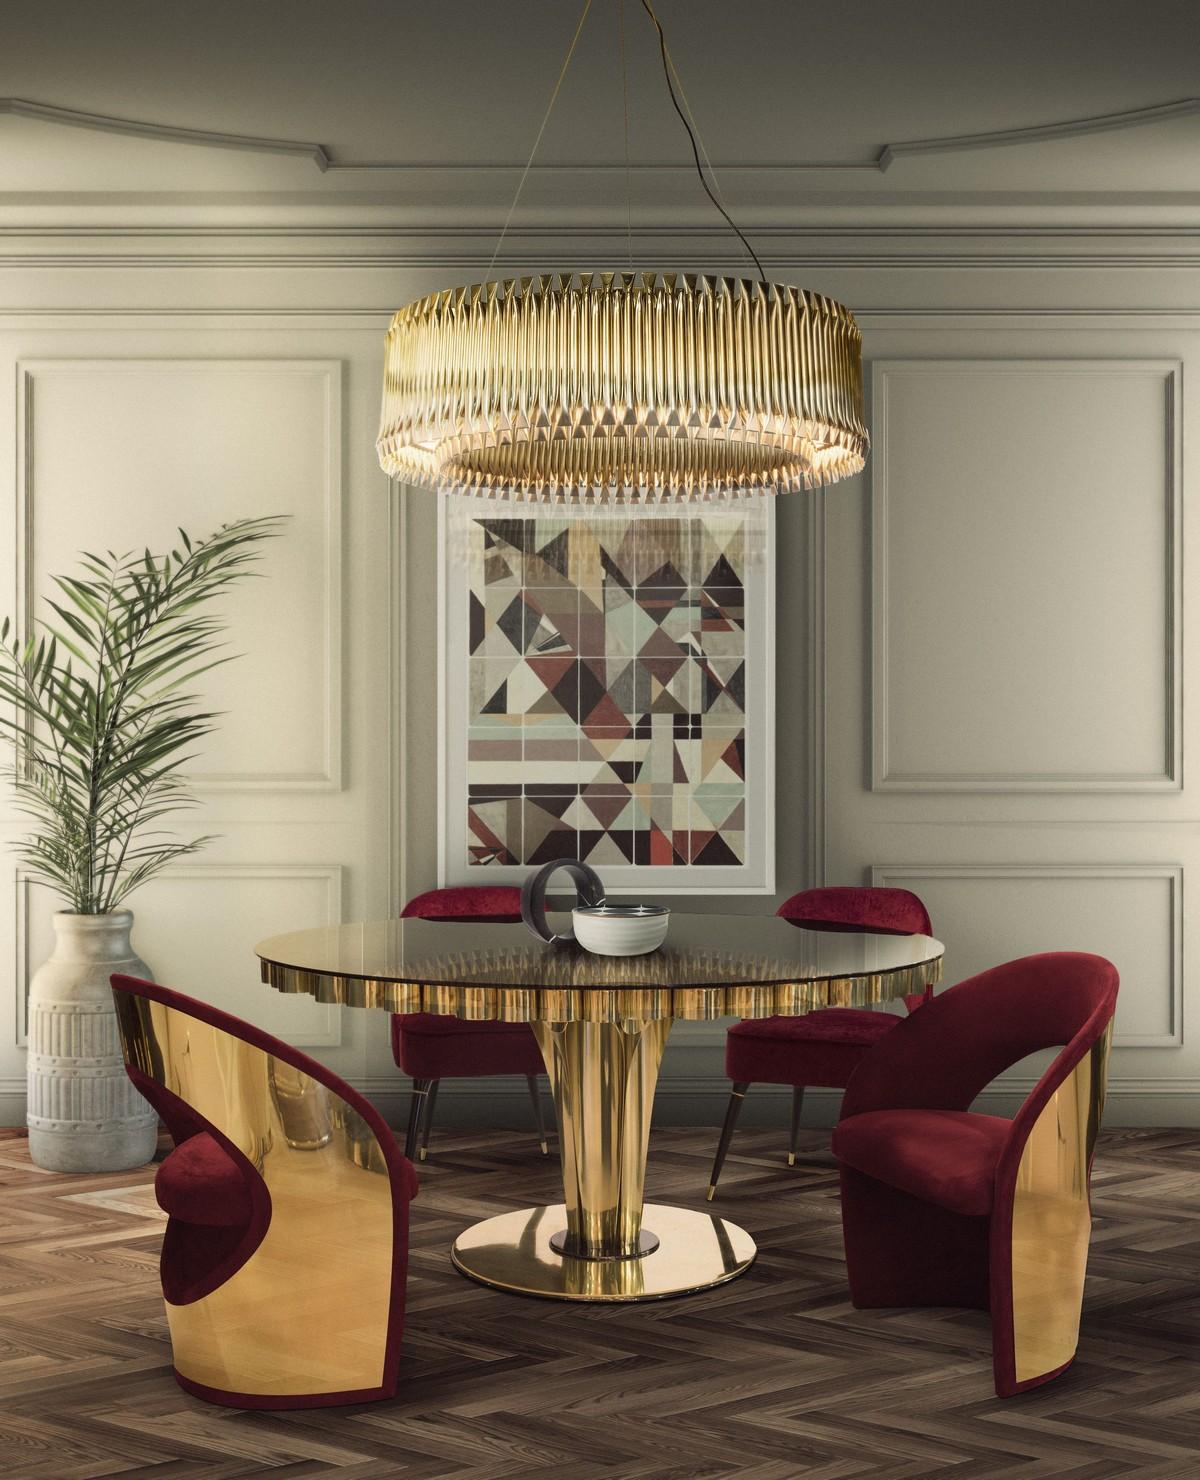 Awe-inspiring Dining Room Decor Inspirations (Part III) dining room decor Awe-inspiring Dining Room Decor Inspirations (Part III) eeeeee